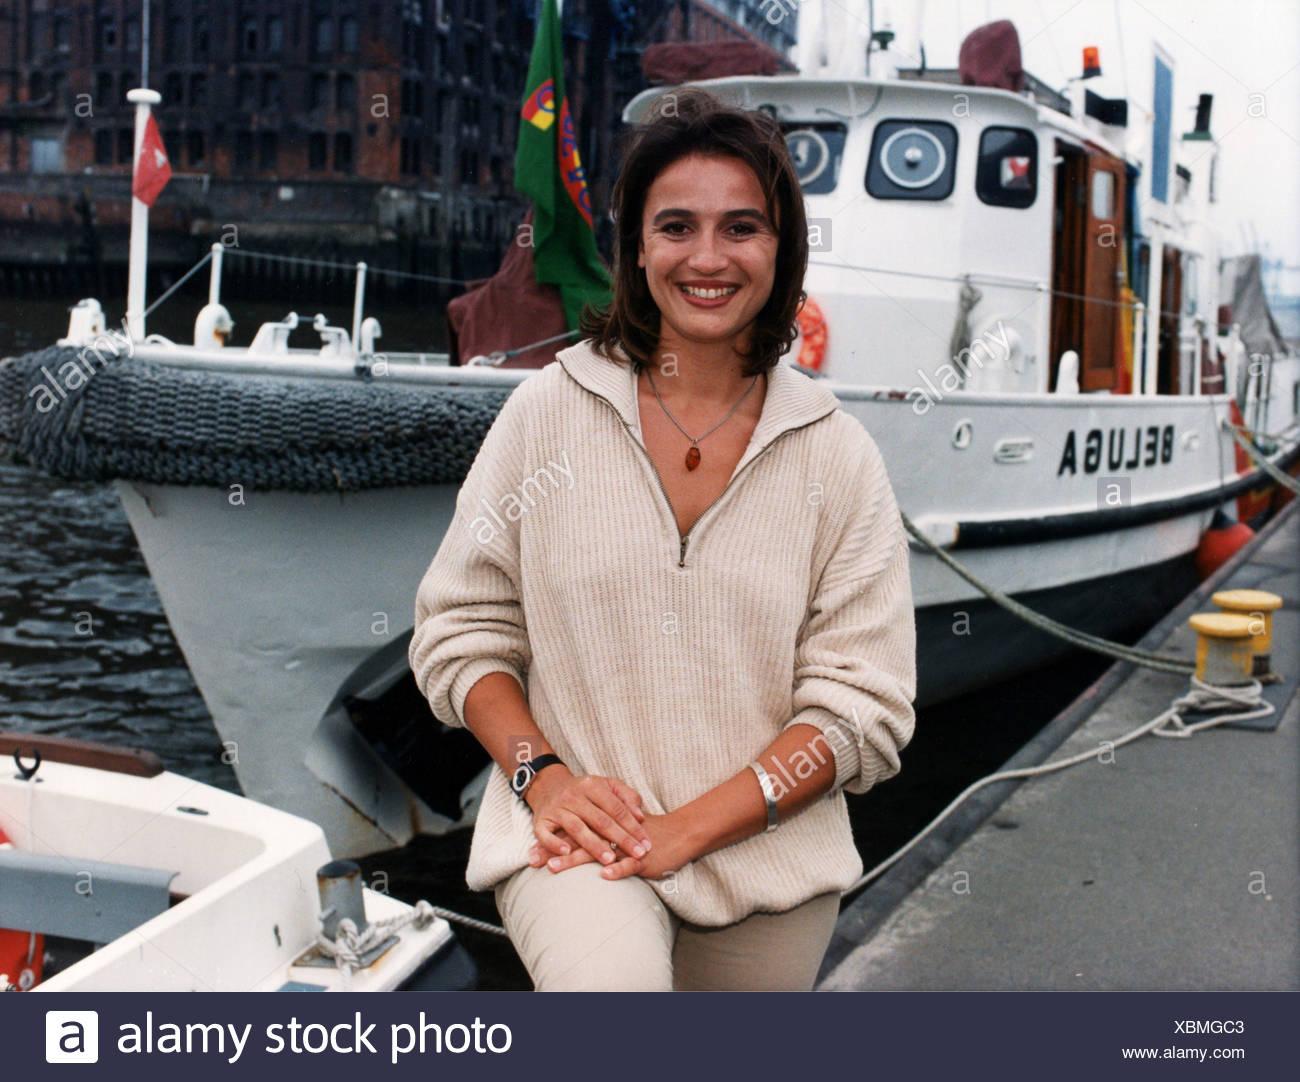 "Maischberger, Sandra, * 26.8.1966, German journalist, TV presenter, half length, in front of the Greenpeace vessel ""Beluga"", Hamburg, Germany, 24.7.1997, Stock Photo"